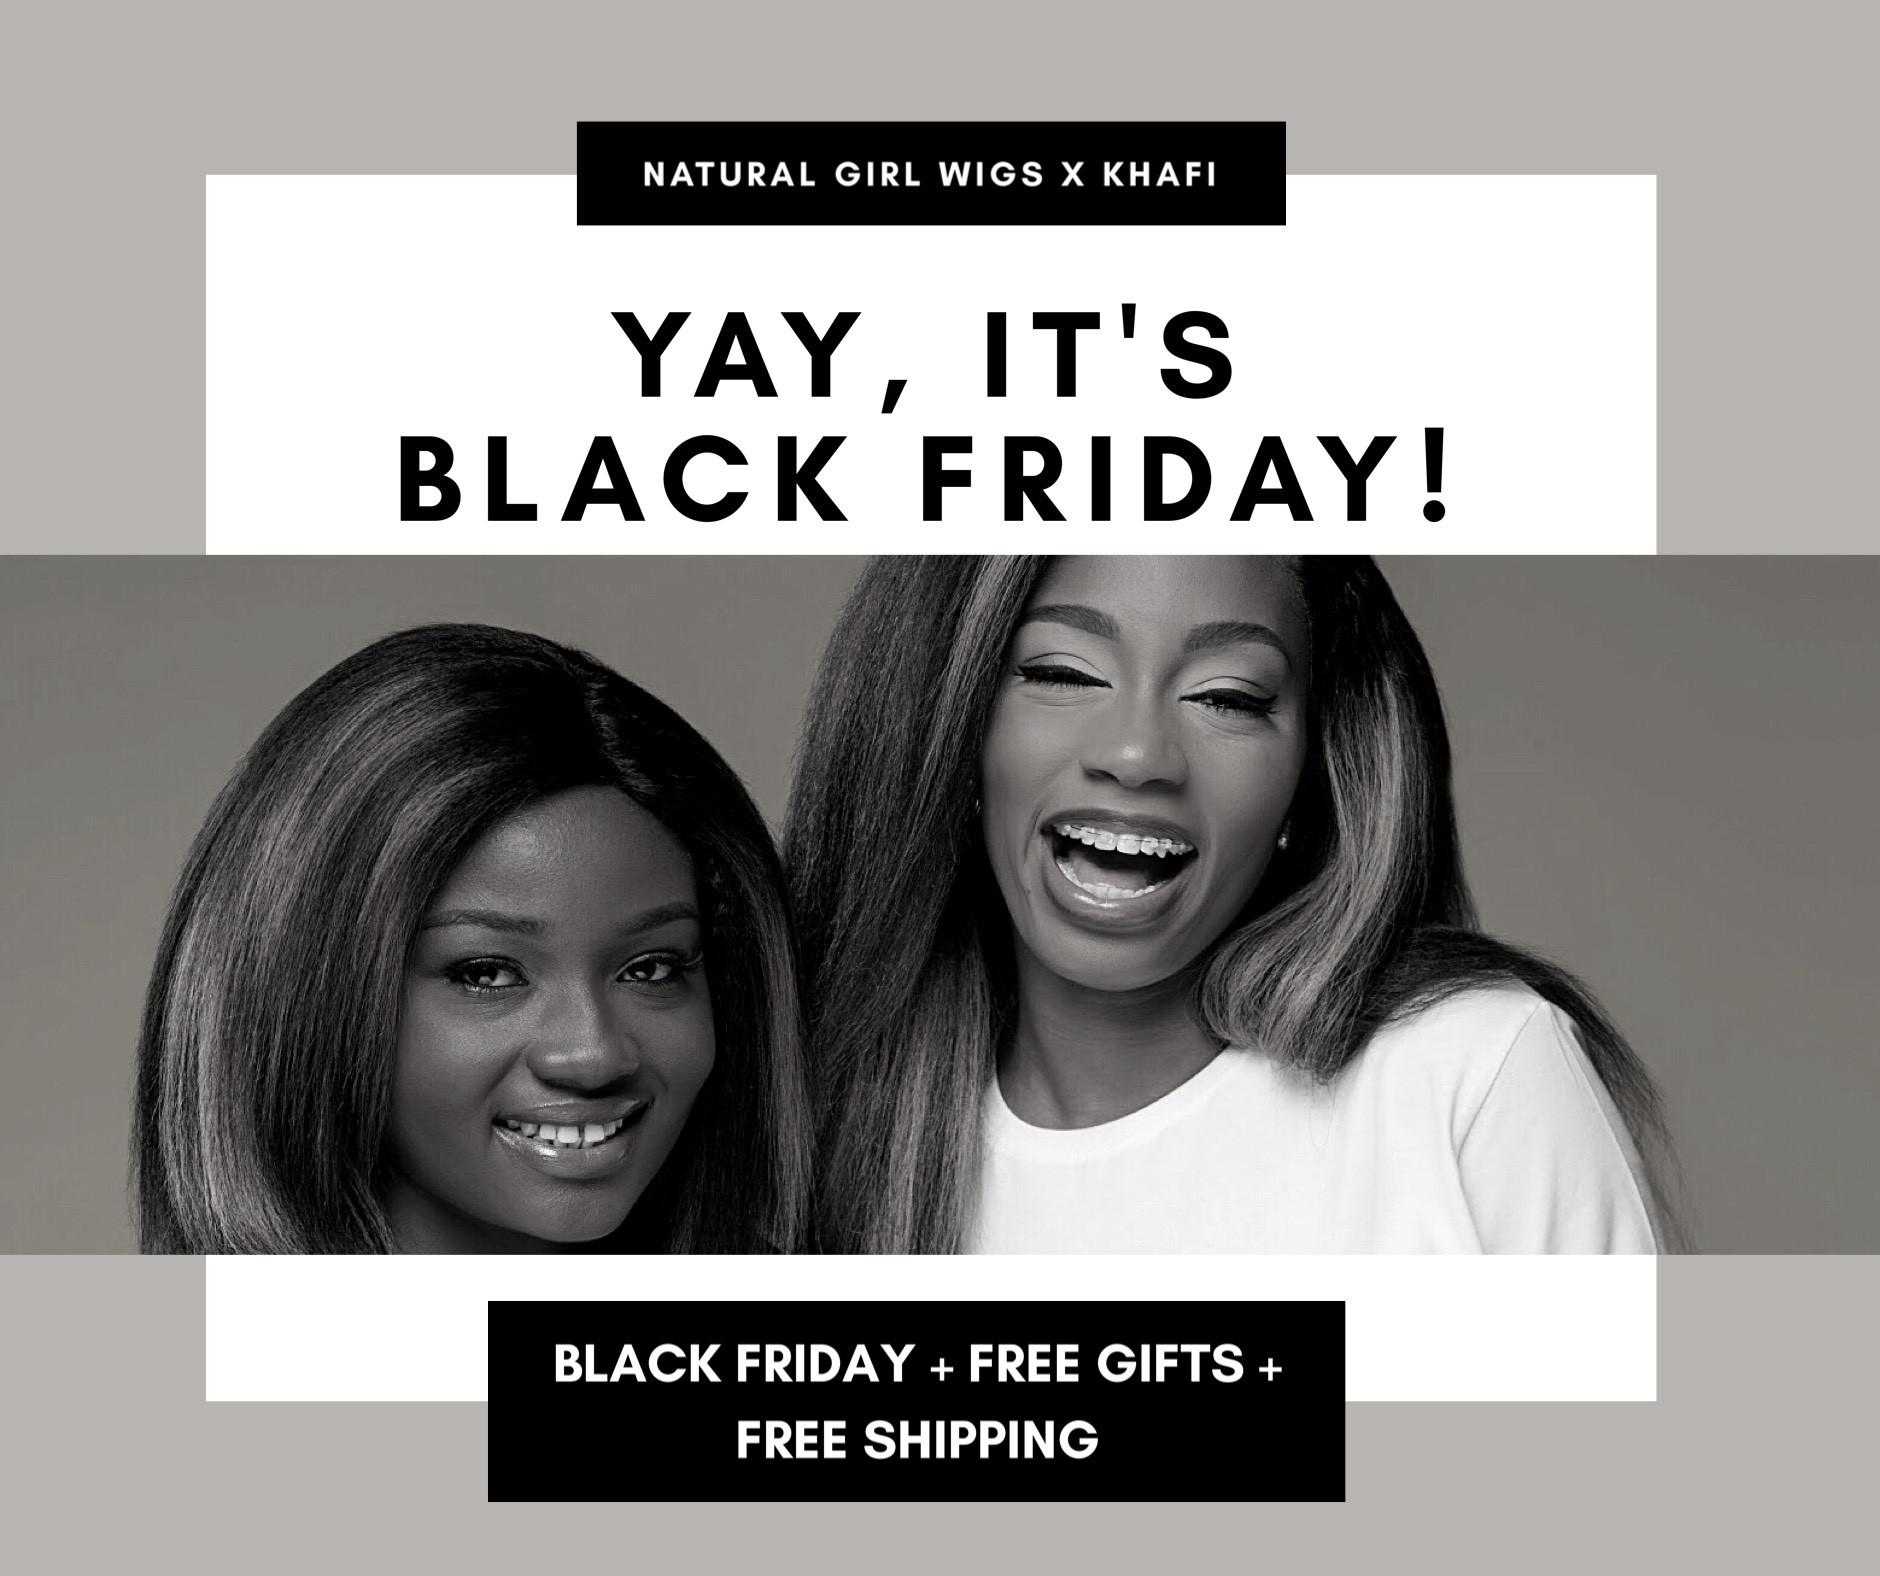 The Black Friday Deal for all Black women!!